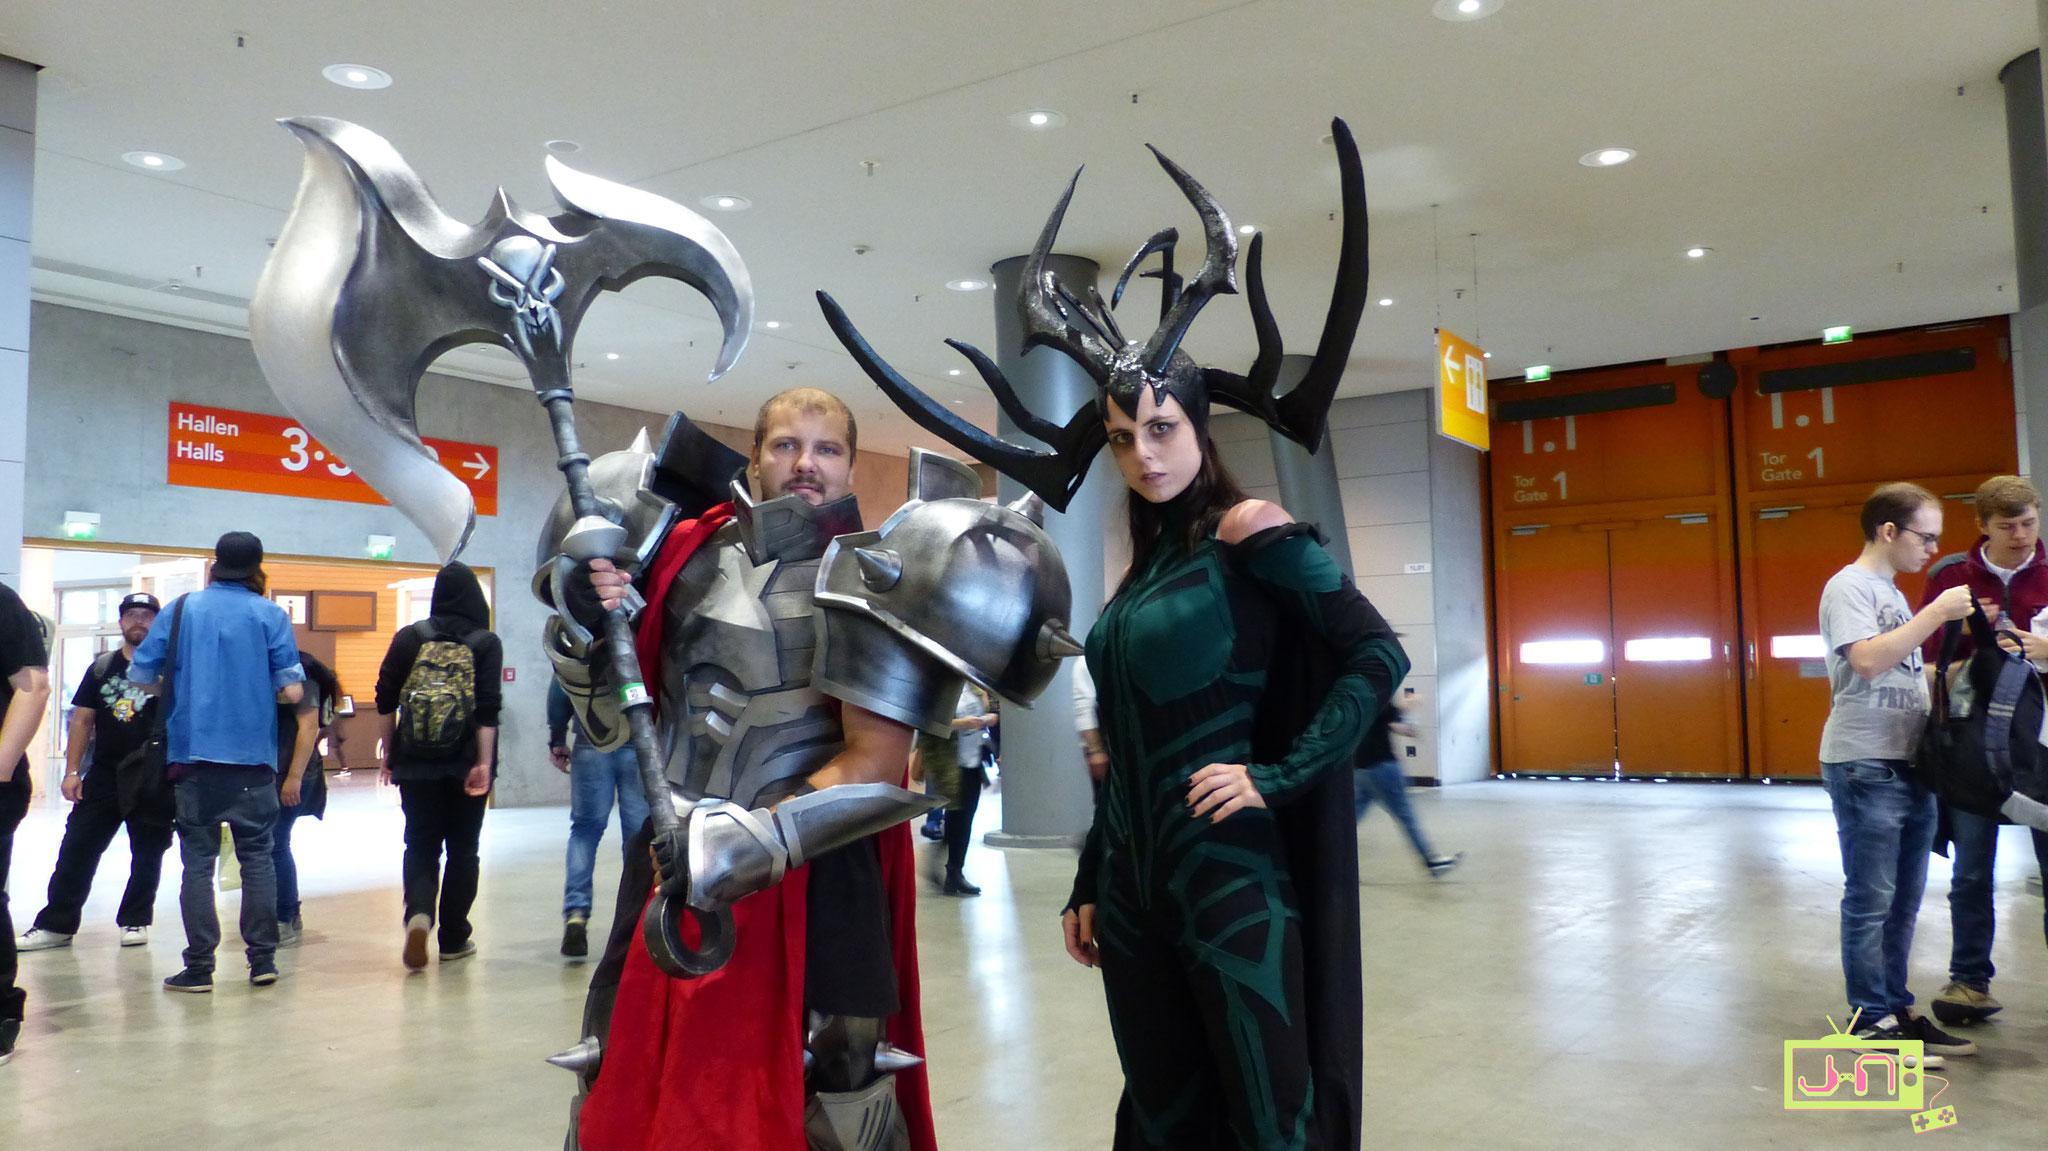 Mon-Kishu (re) als Hela, Thors künftiger Antagonistin im Kino